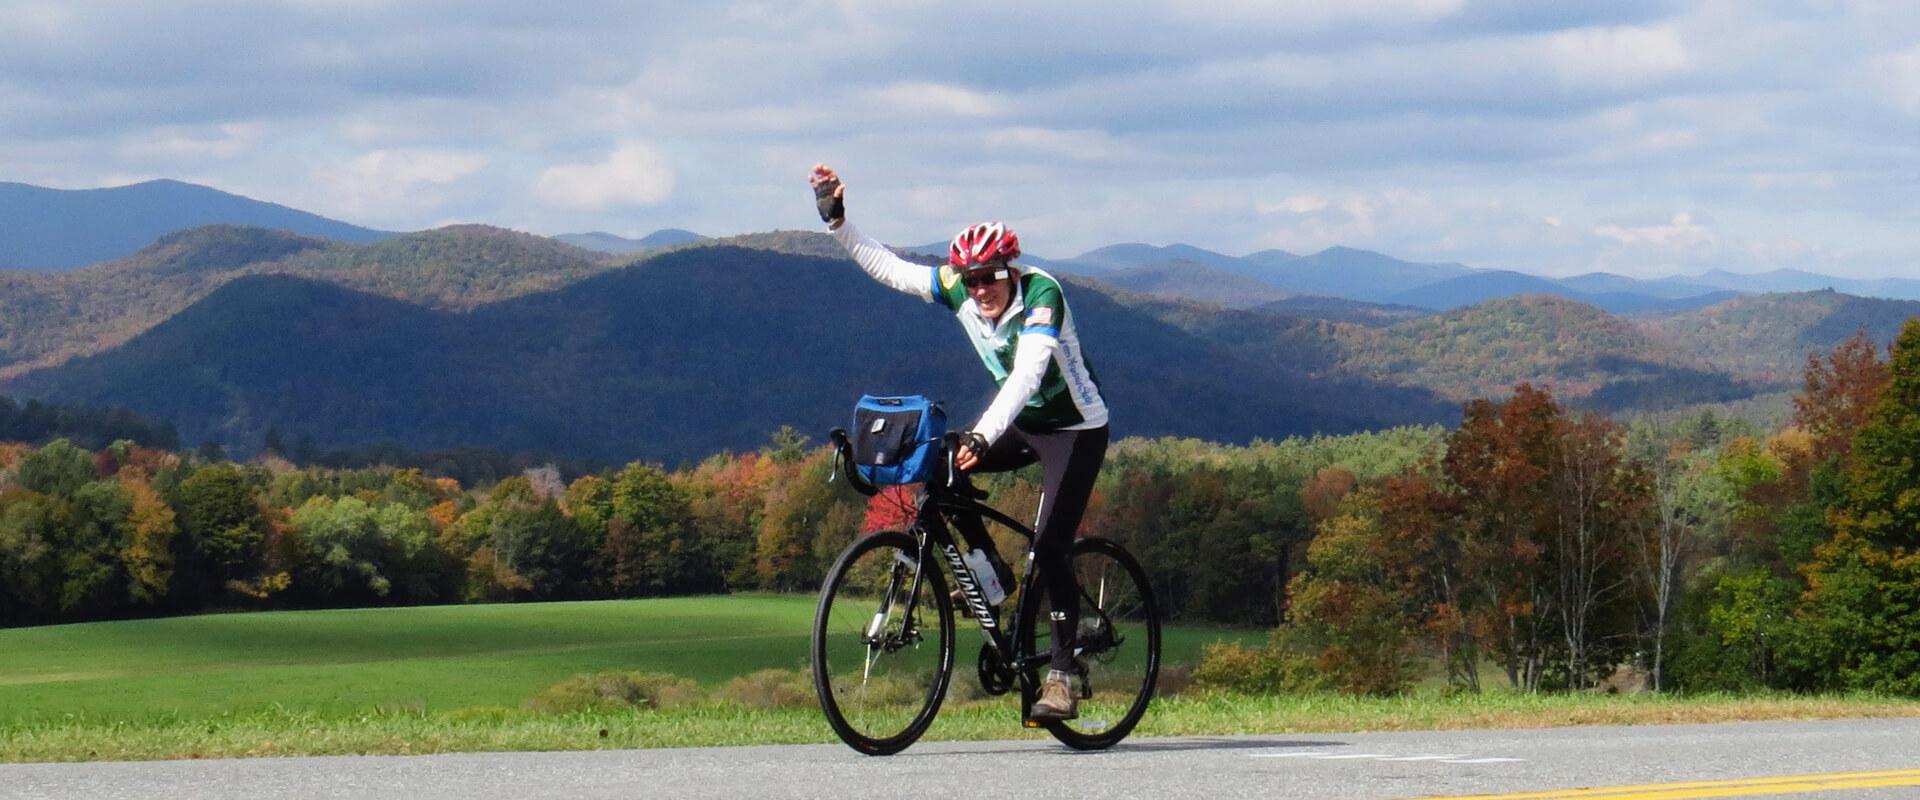 cycling freedom ile ilgili görsel sonucu